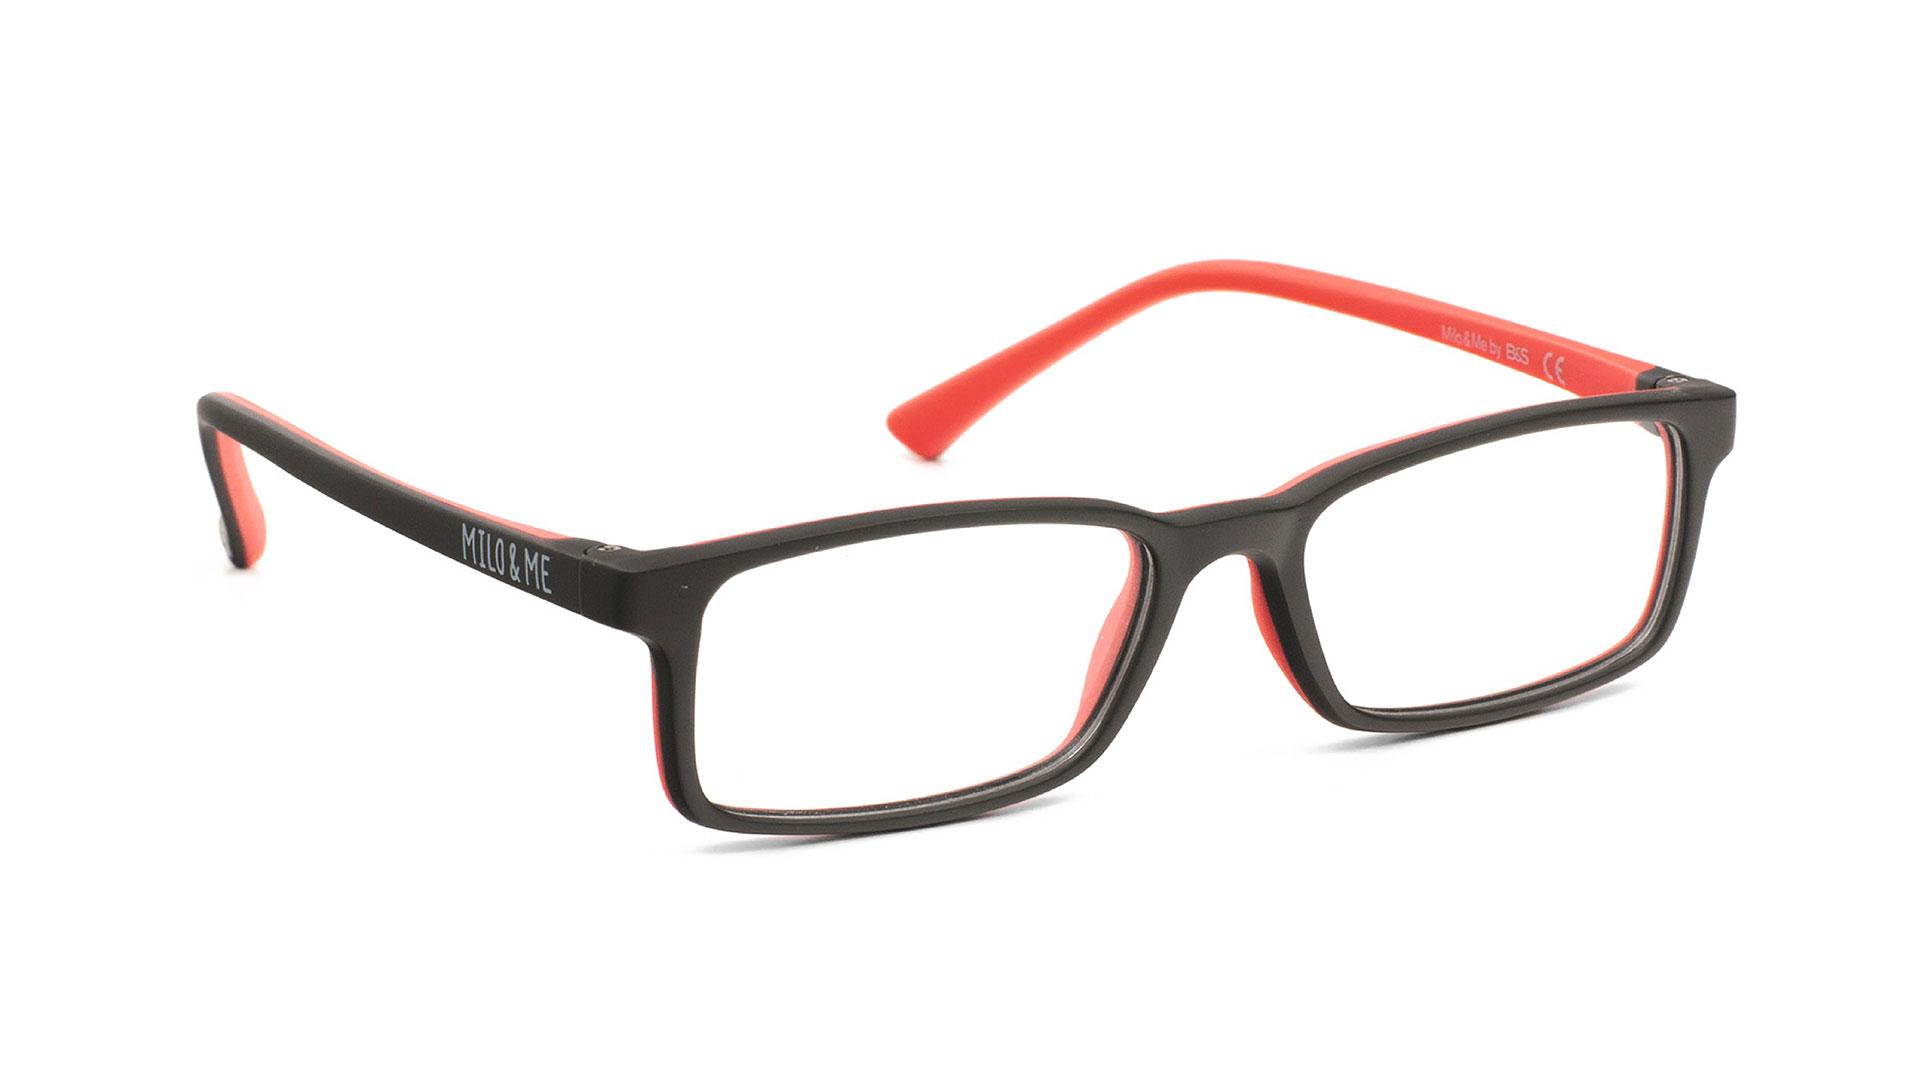 BlackRed H85020-13 - Milo & Me Eyewear - Optimum RX Lens Specialists